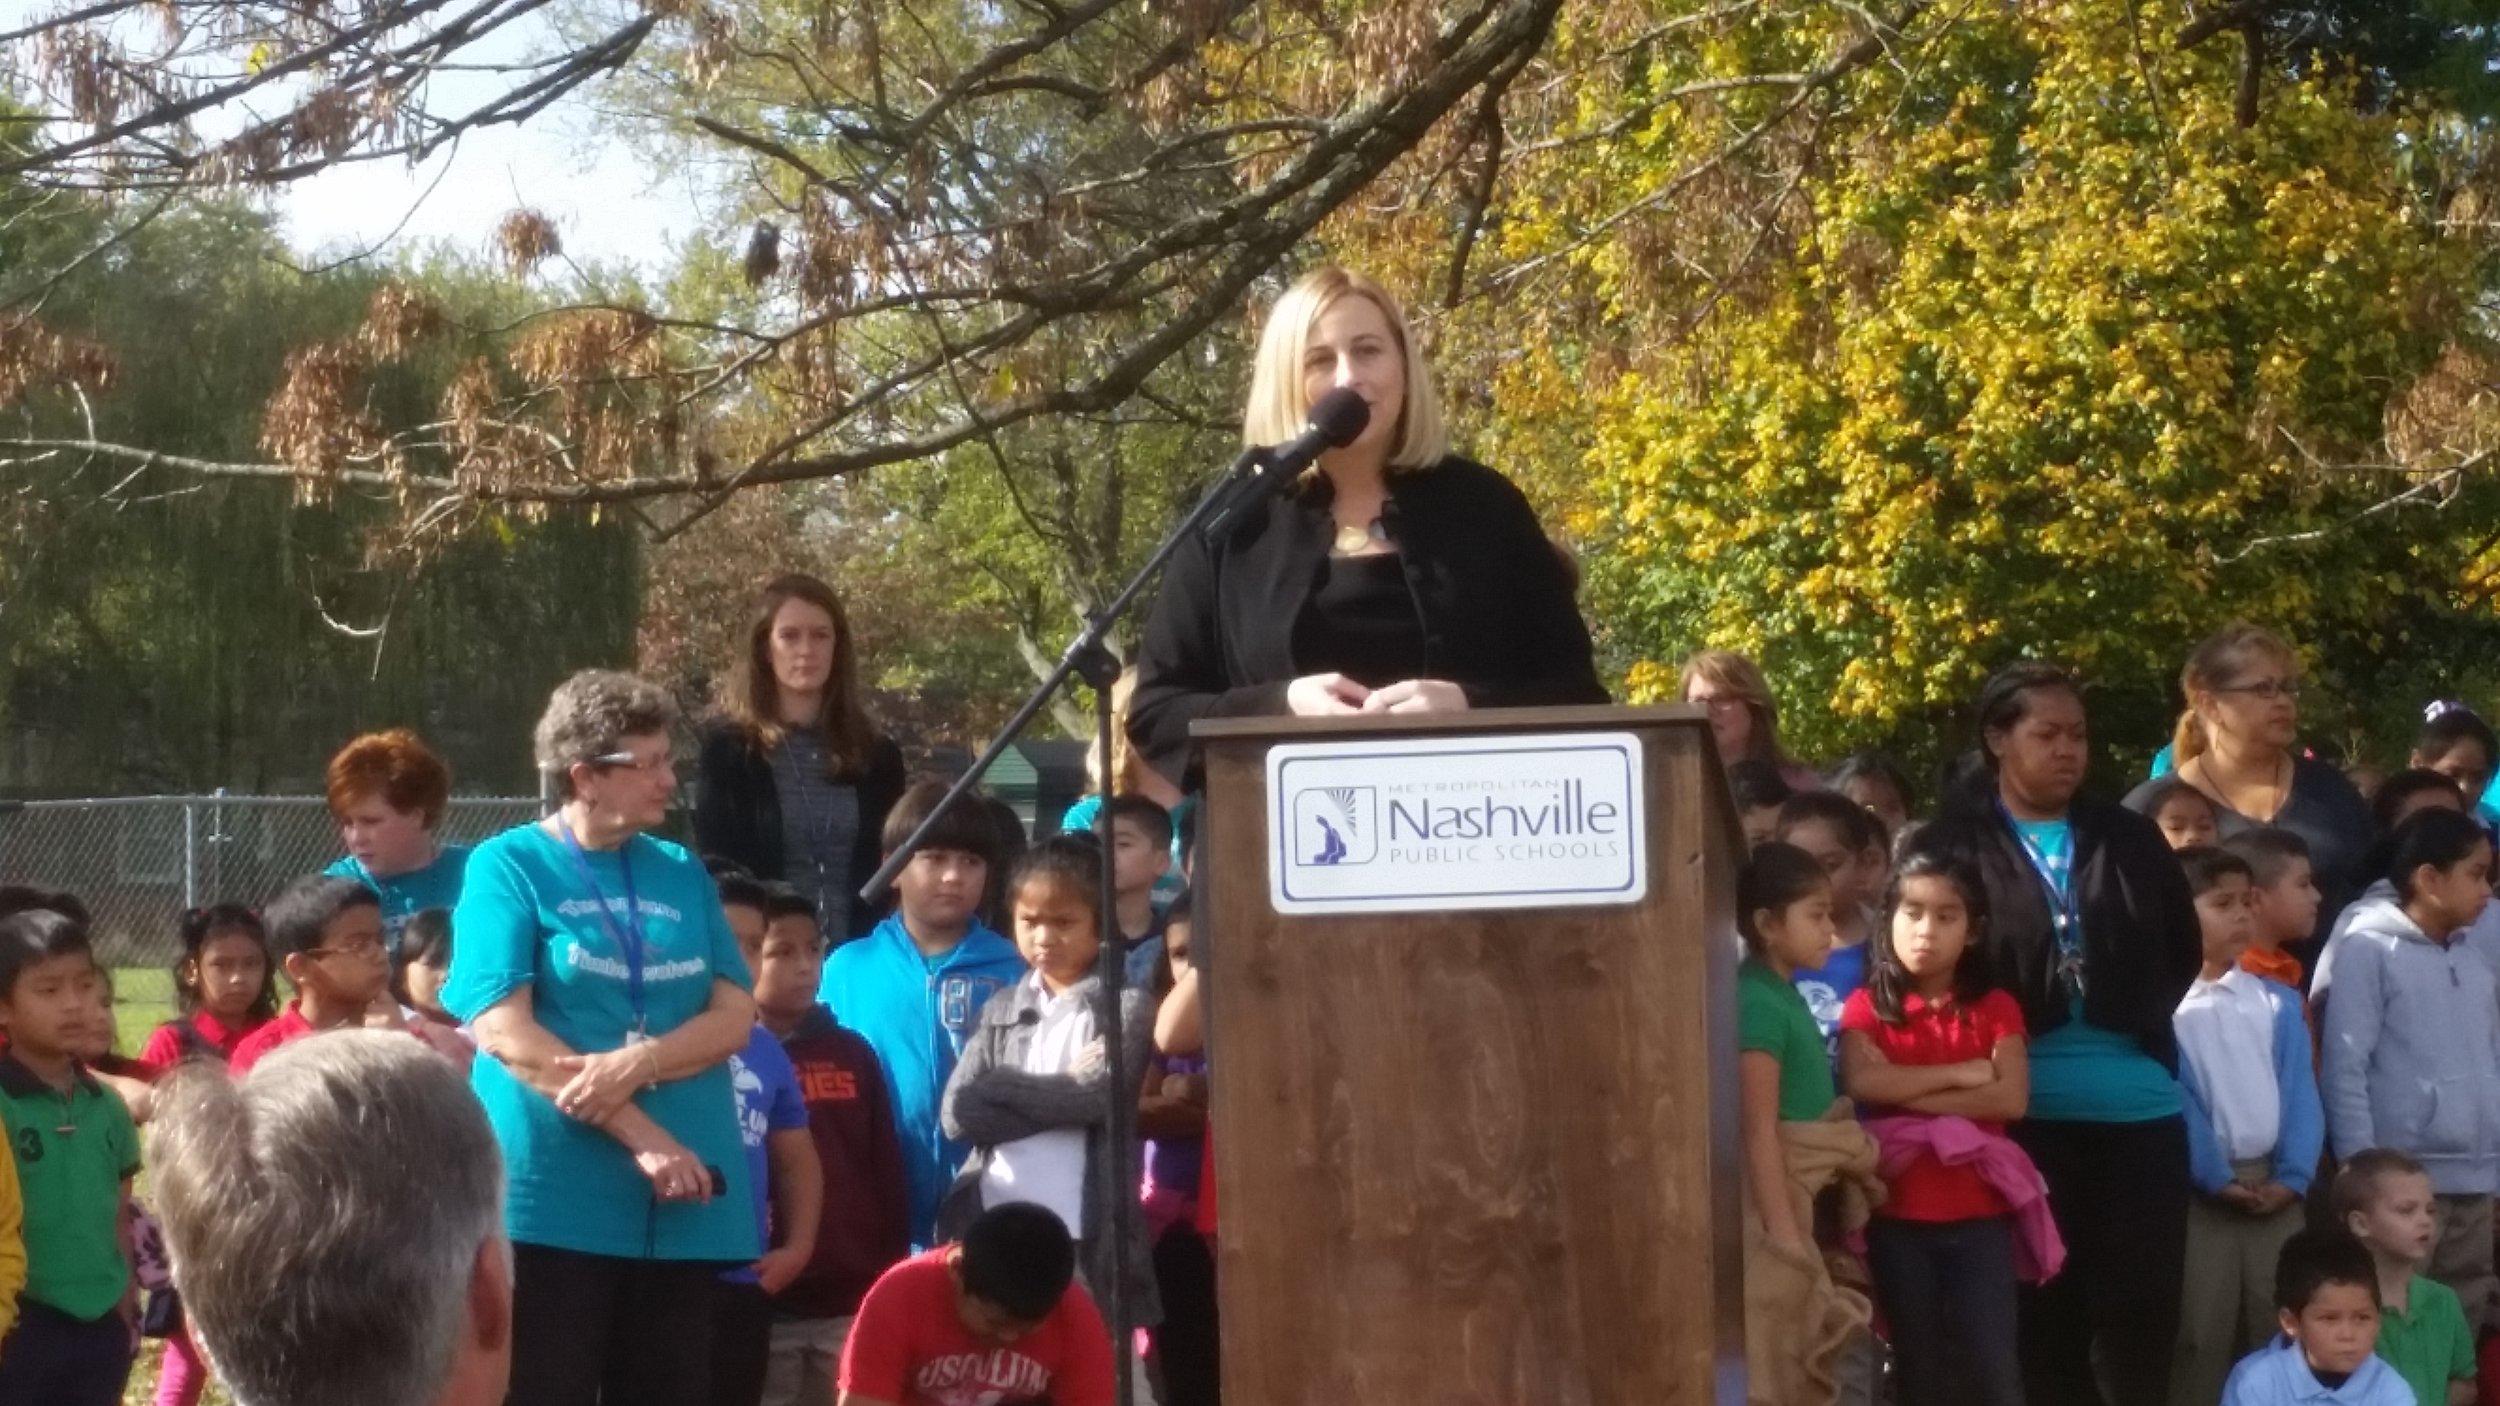 Nashville Metro Mayor Megan Barry speaks at the Tusculum Elementary School Groundbreaking Ceremony held on October 29, 2015.